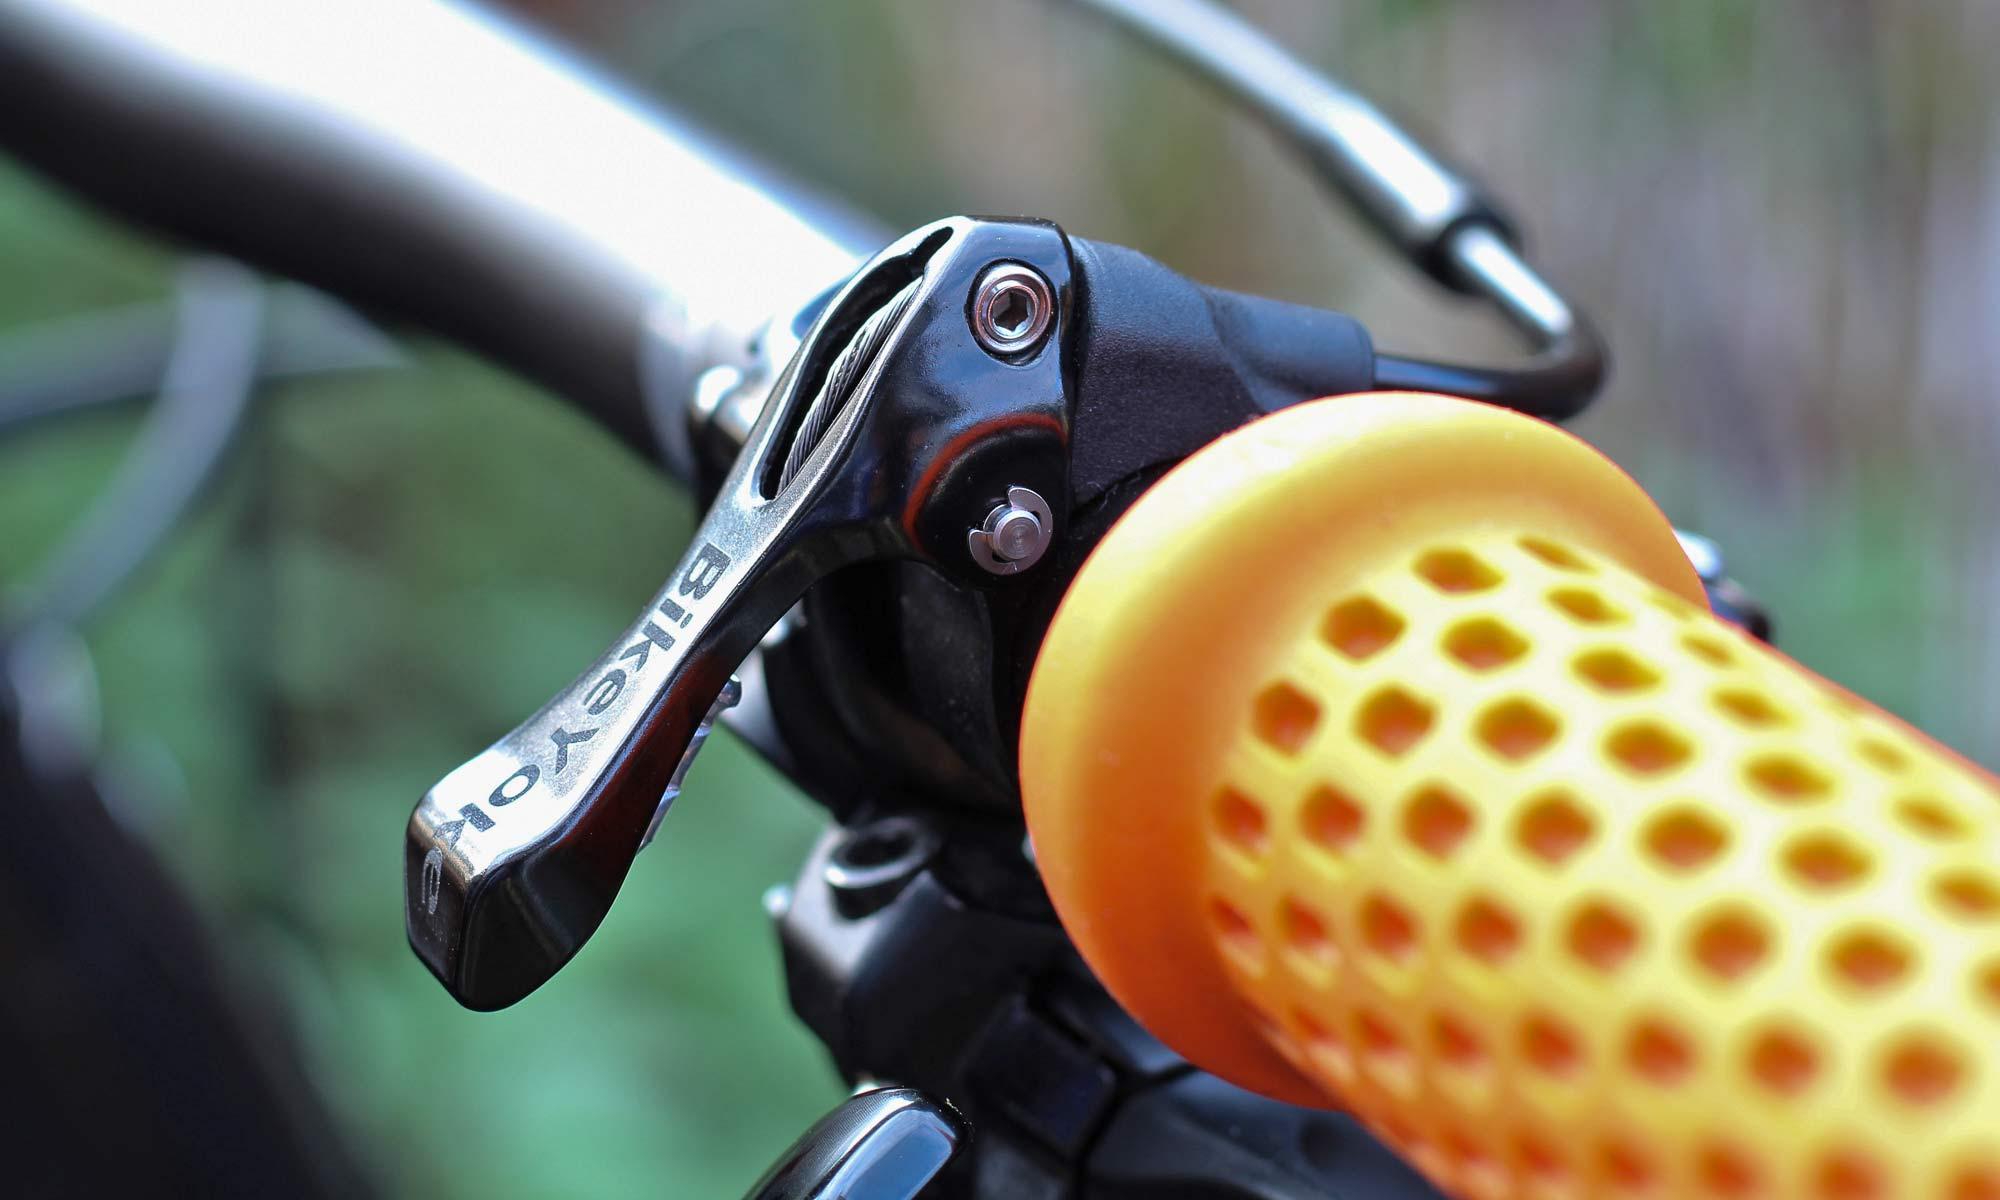 New BikeYoke 2X dropper Remote, on bar